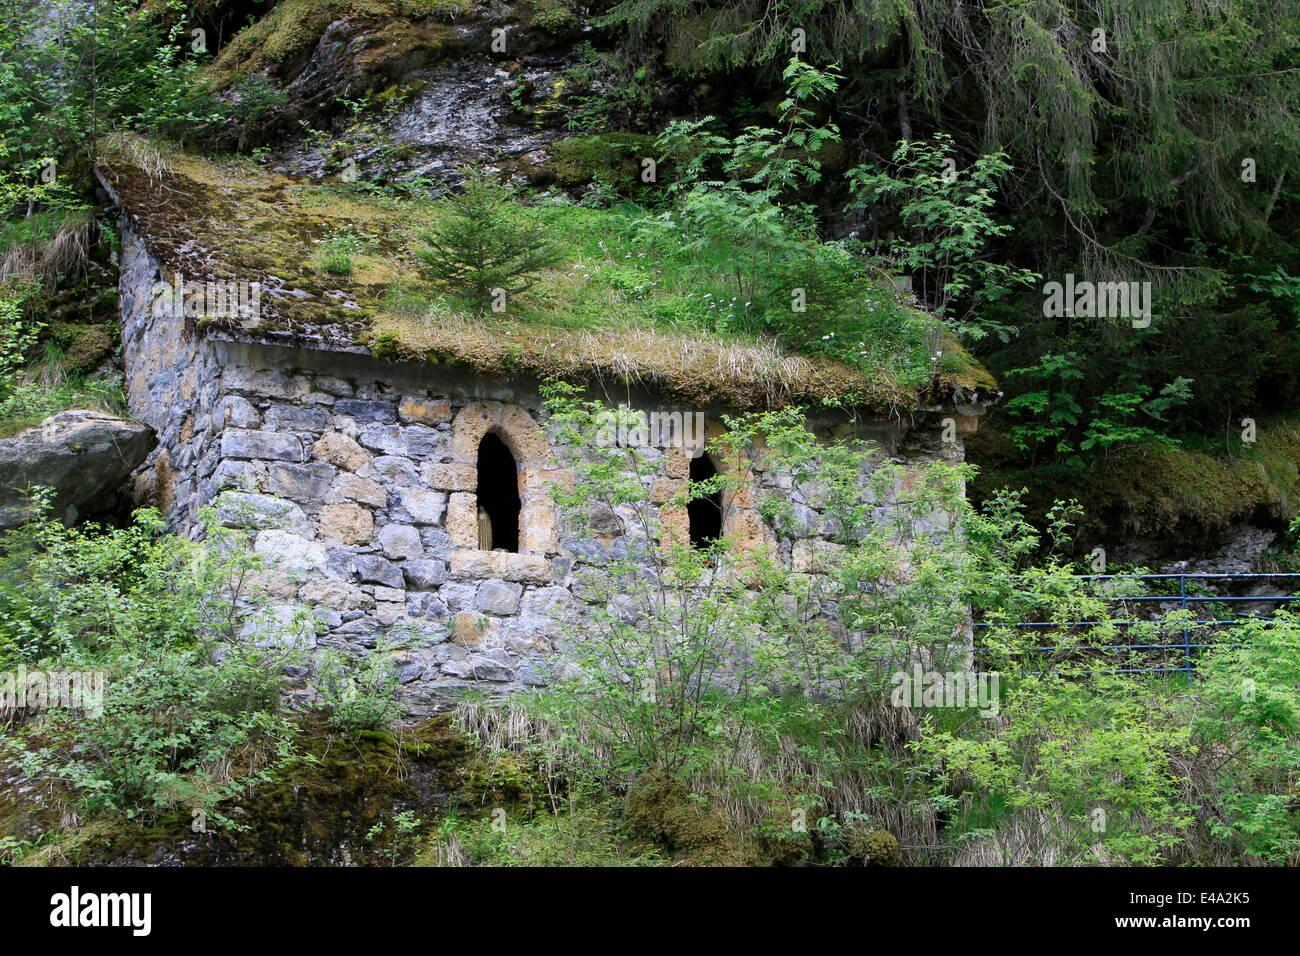 The Holy Chapel, Les Contamines-Montjoie, Haute-Savoie, France, Europe - Stock Image